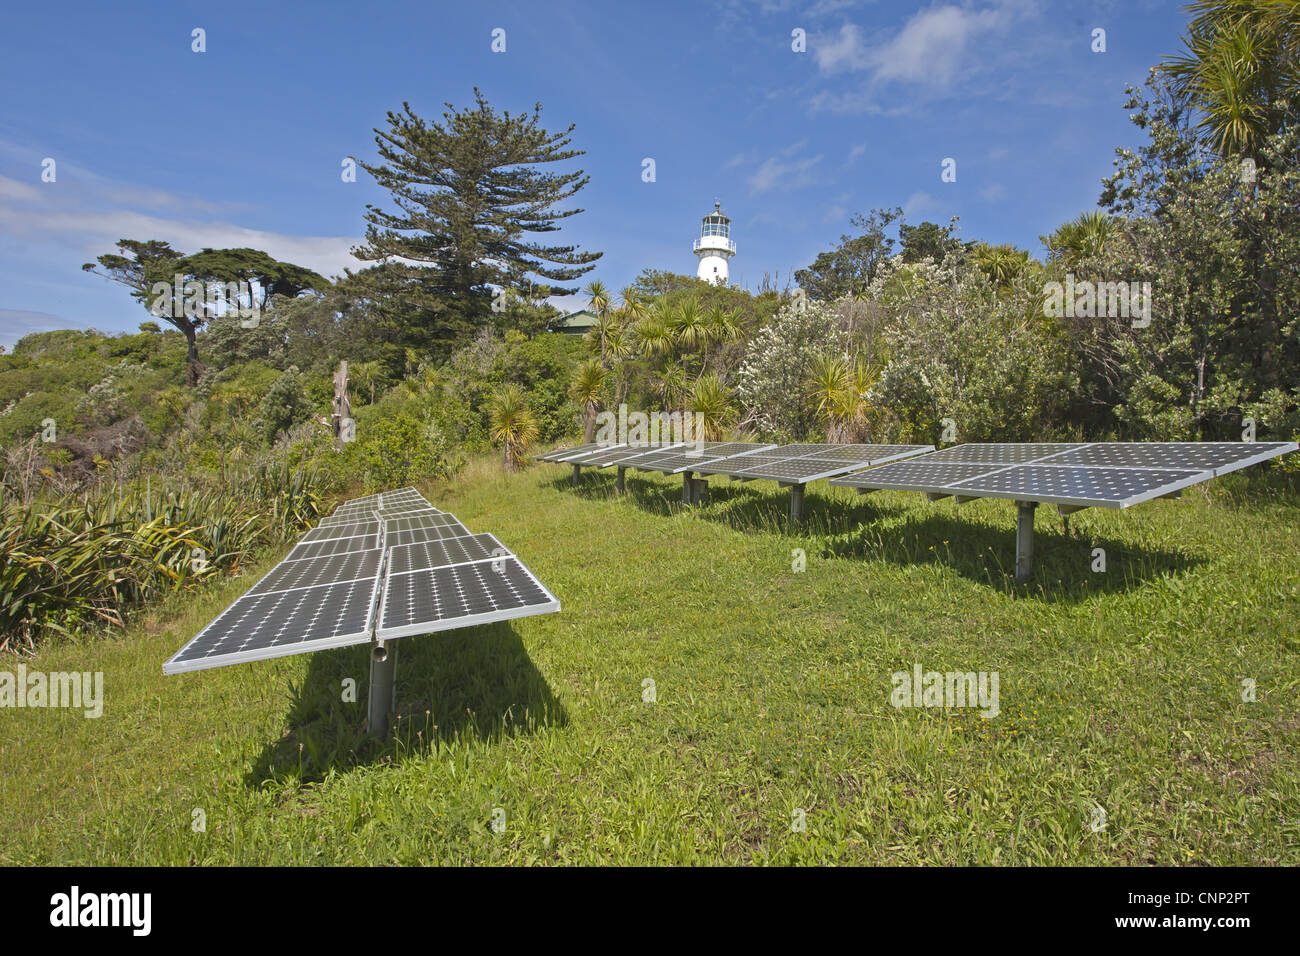 Solar energy panels lighthouse island wildlife sanctuary Tiritiri Matangi Island Hauraki Gulf North Island New Zealand - Stock Image